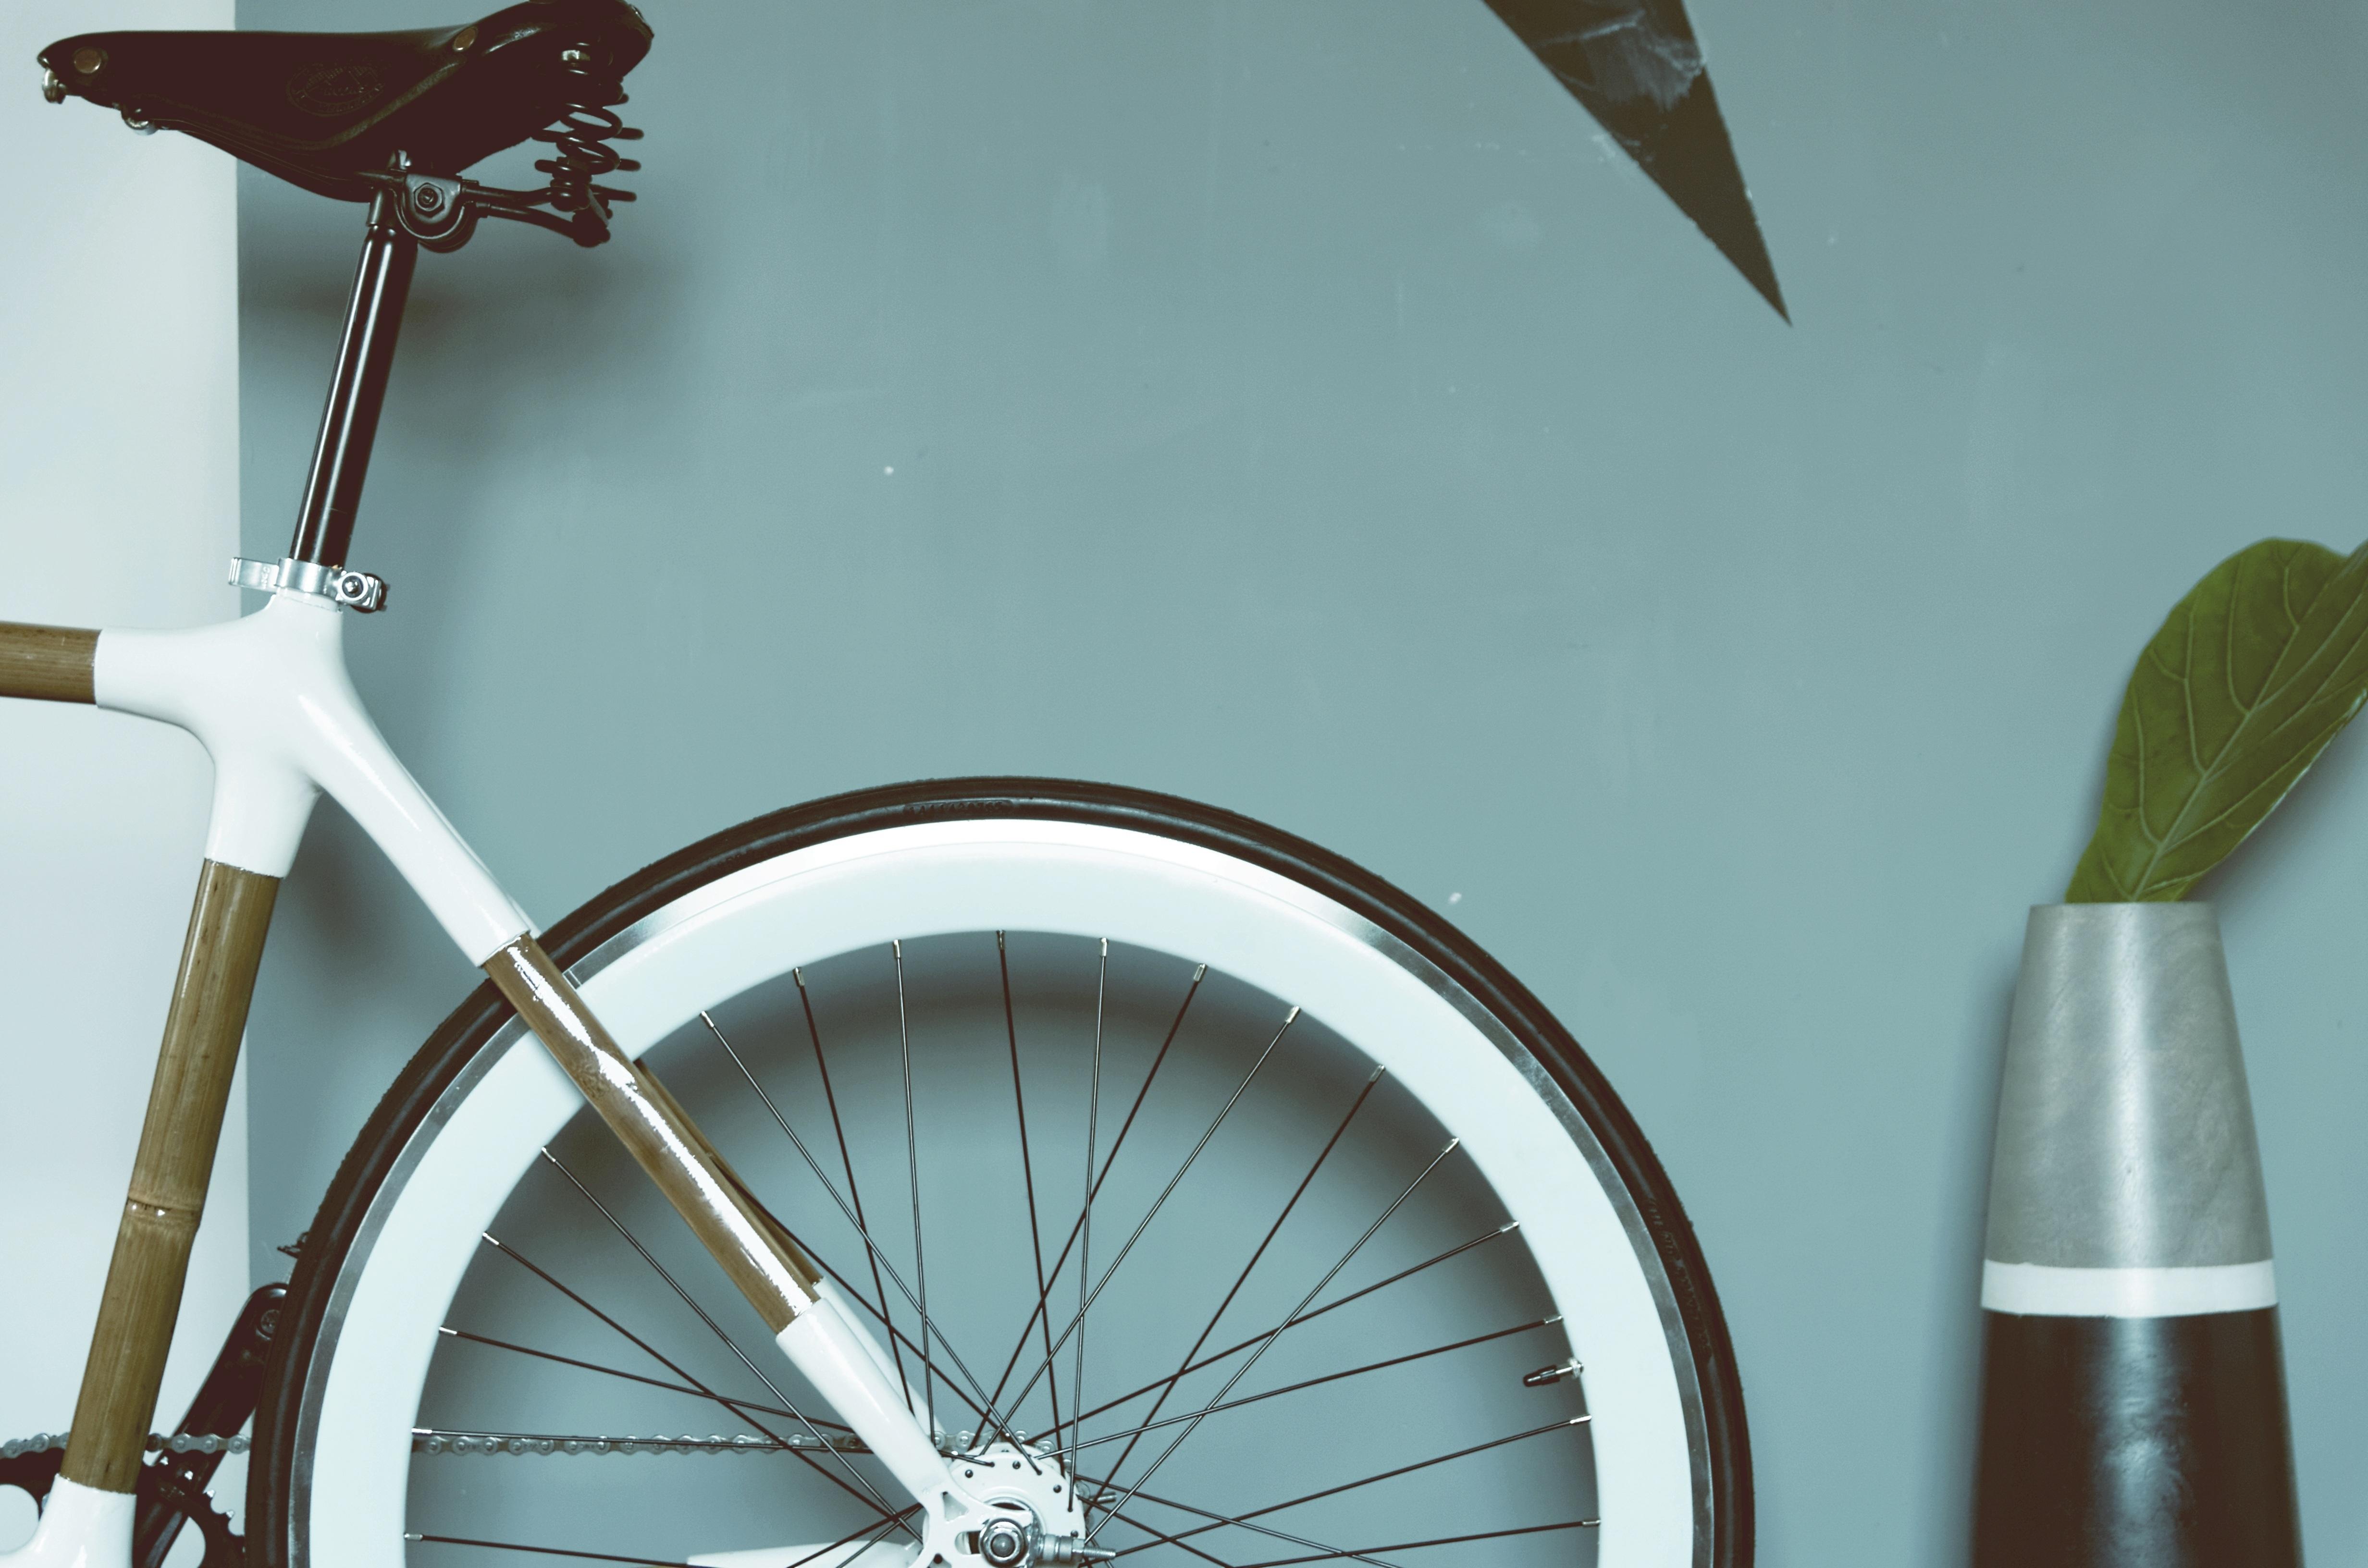 Kostenlose foto : Jahrgang, Rad, Retro, Innere, Fahrrad, Fahrzeug ...